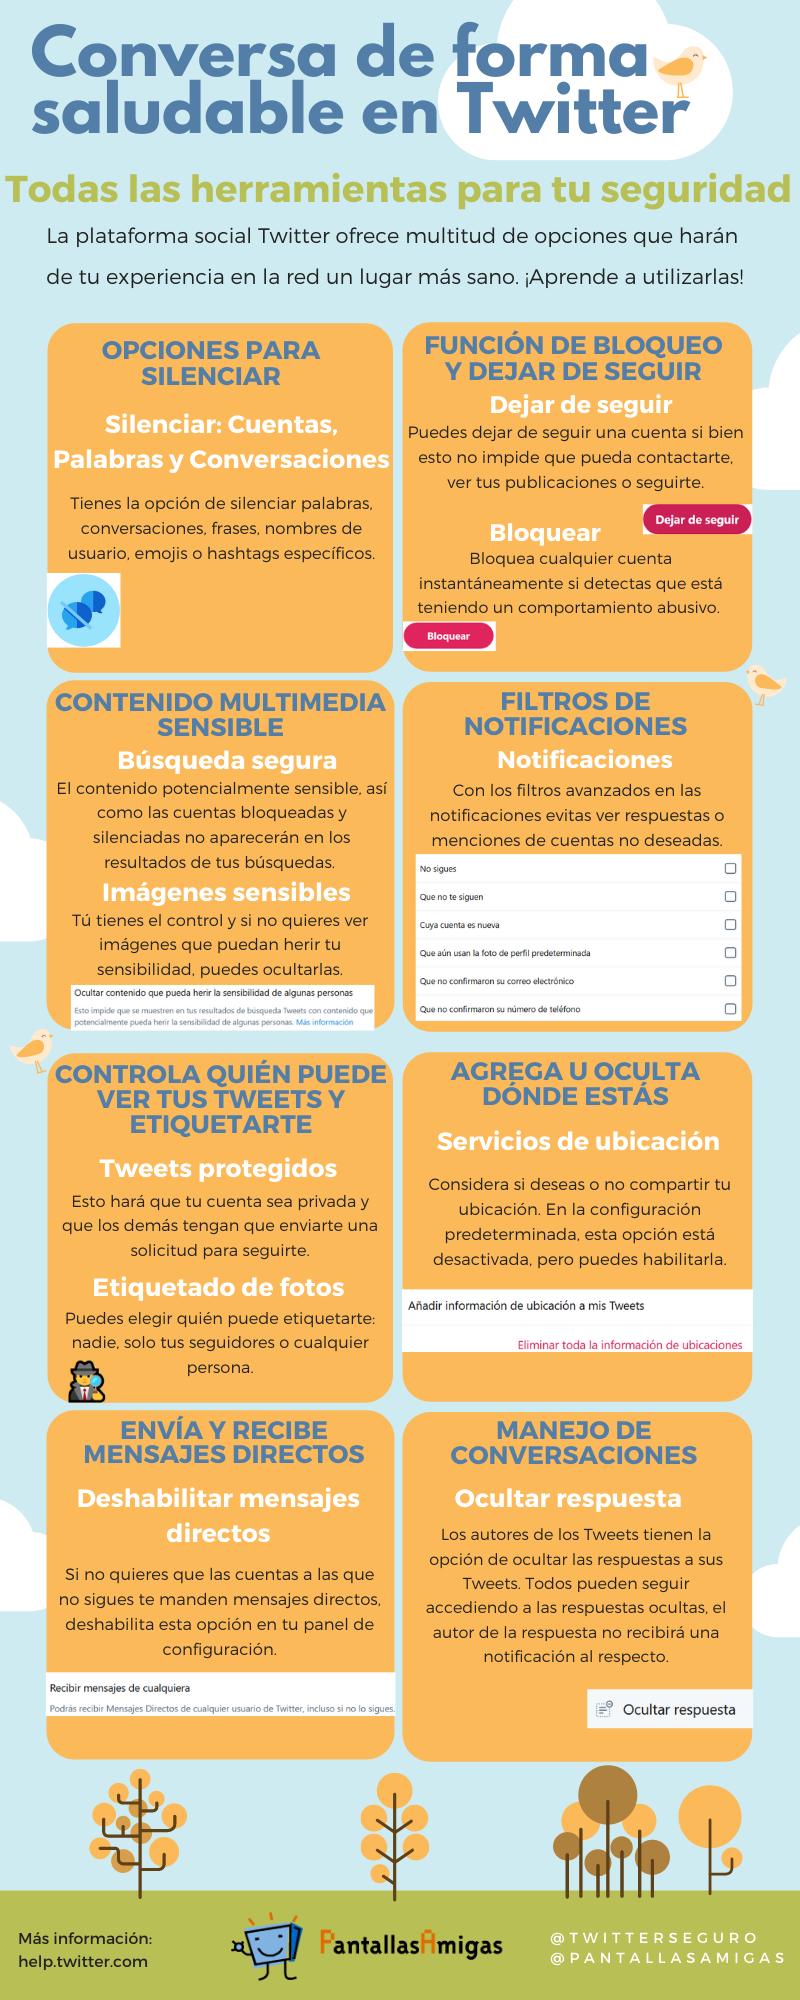 Infografia - PantallasAmigas Herramientas-utilizar-Twitter-seguridad